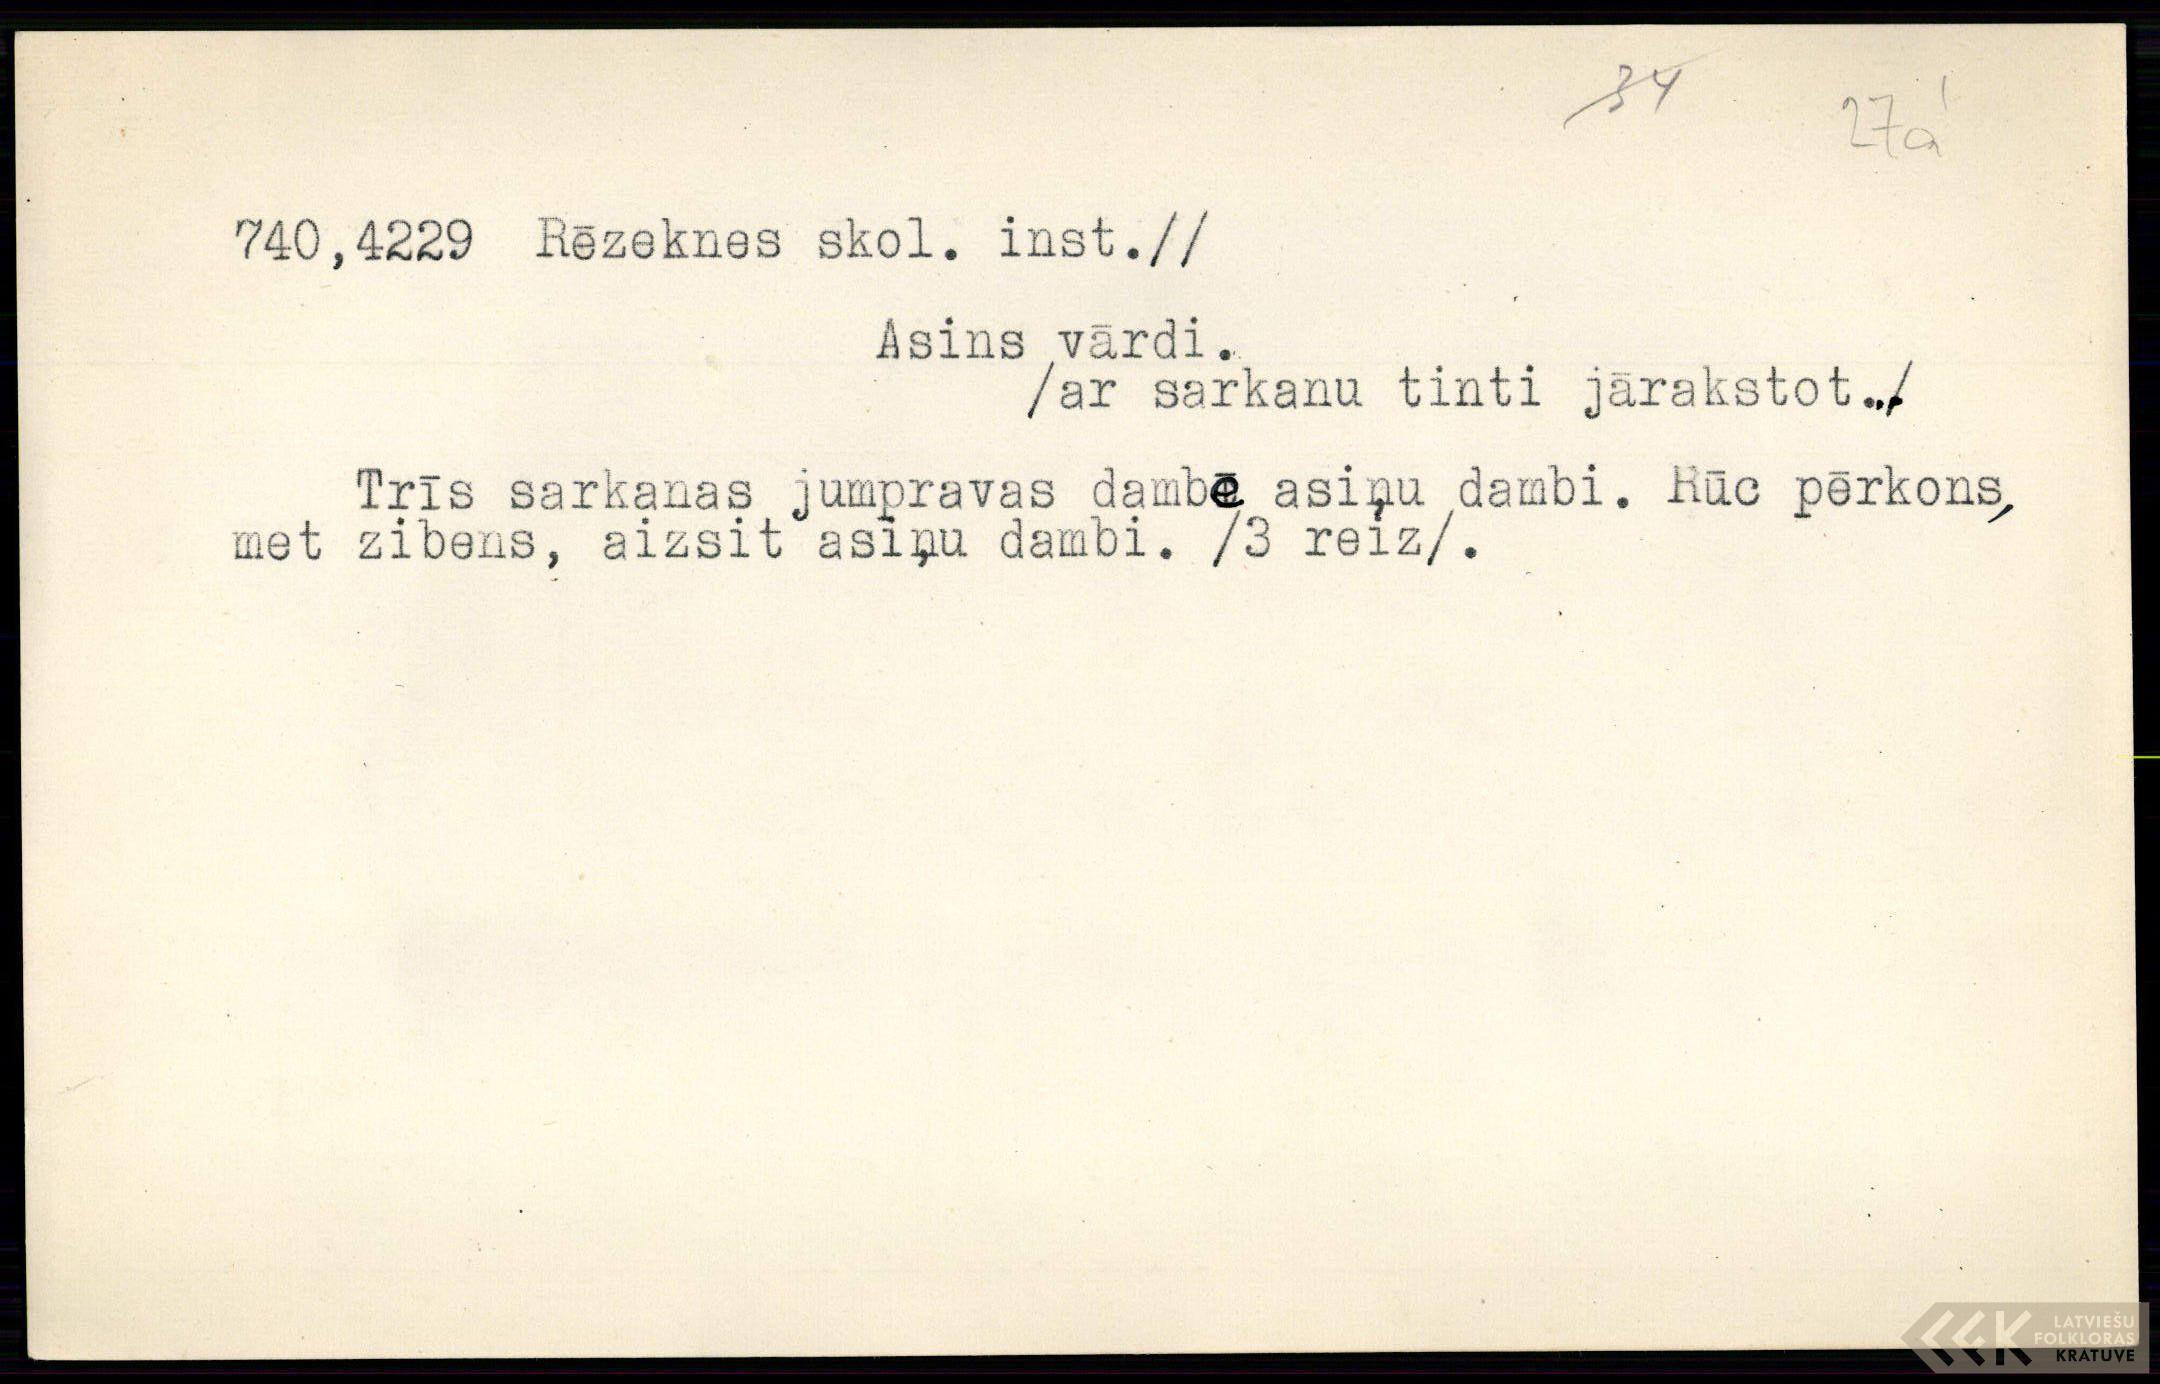 LFK-0740-04229-buramvardu-kartoteka